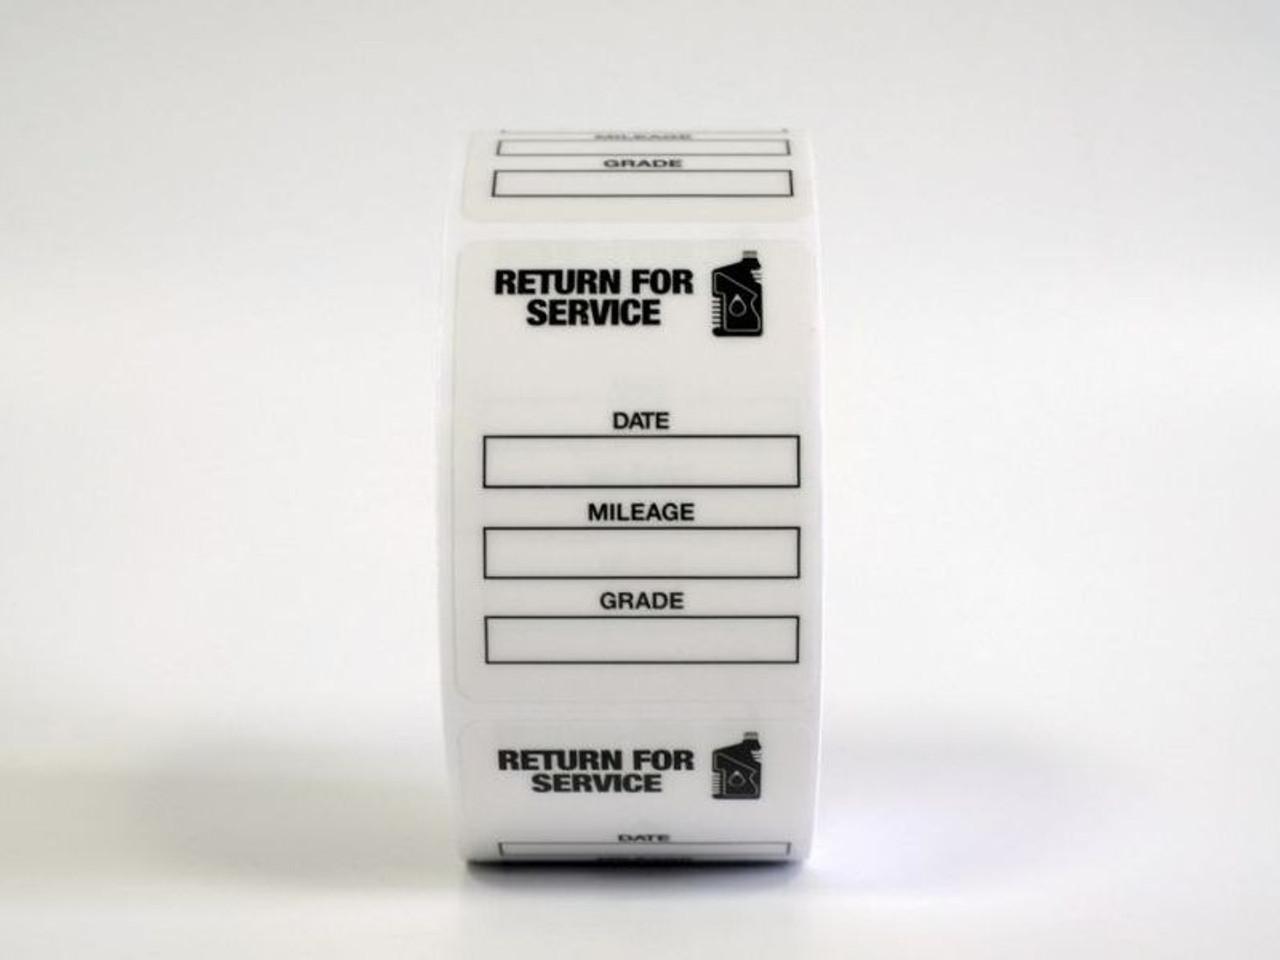 Roll of Generic Oil Change Labels - Handwritten Return for Service Black Oil Bottle